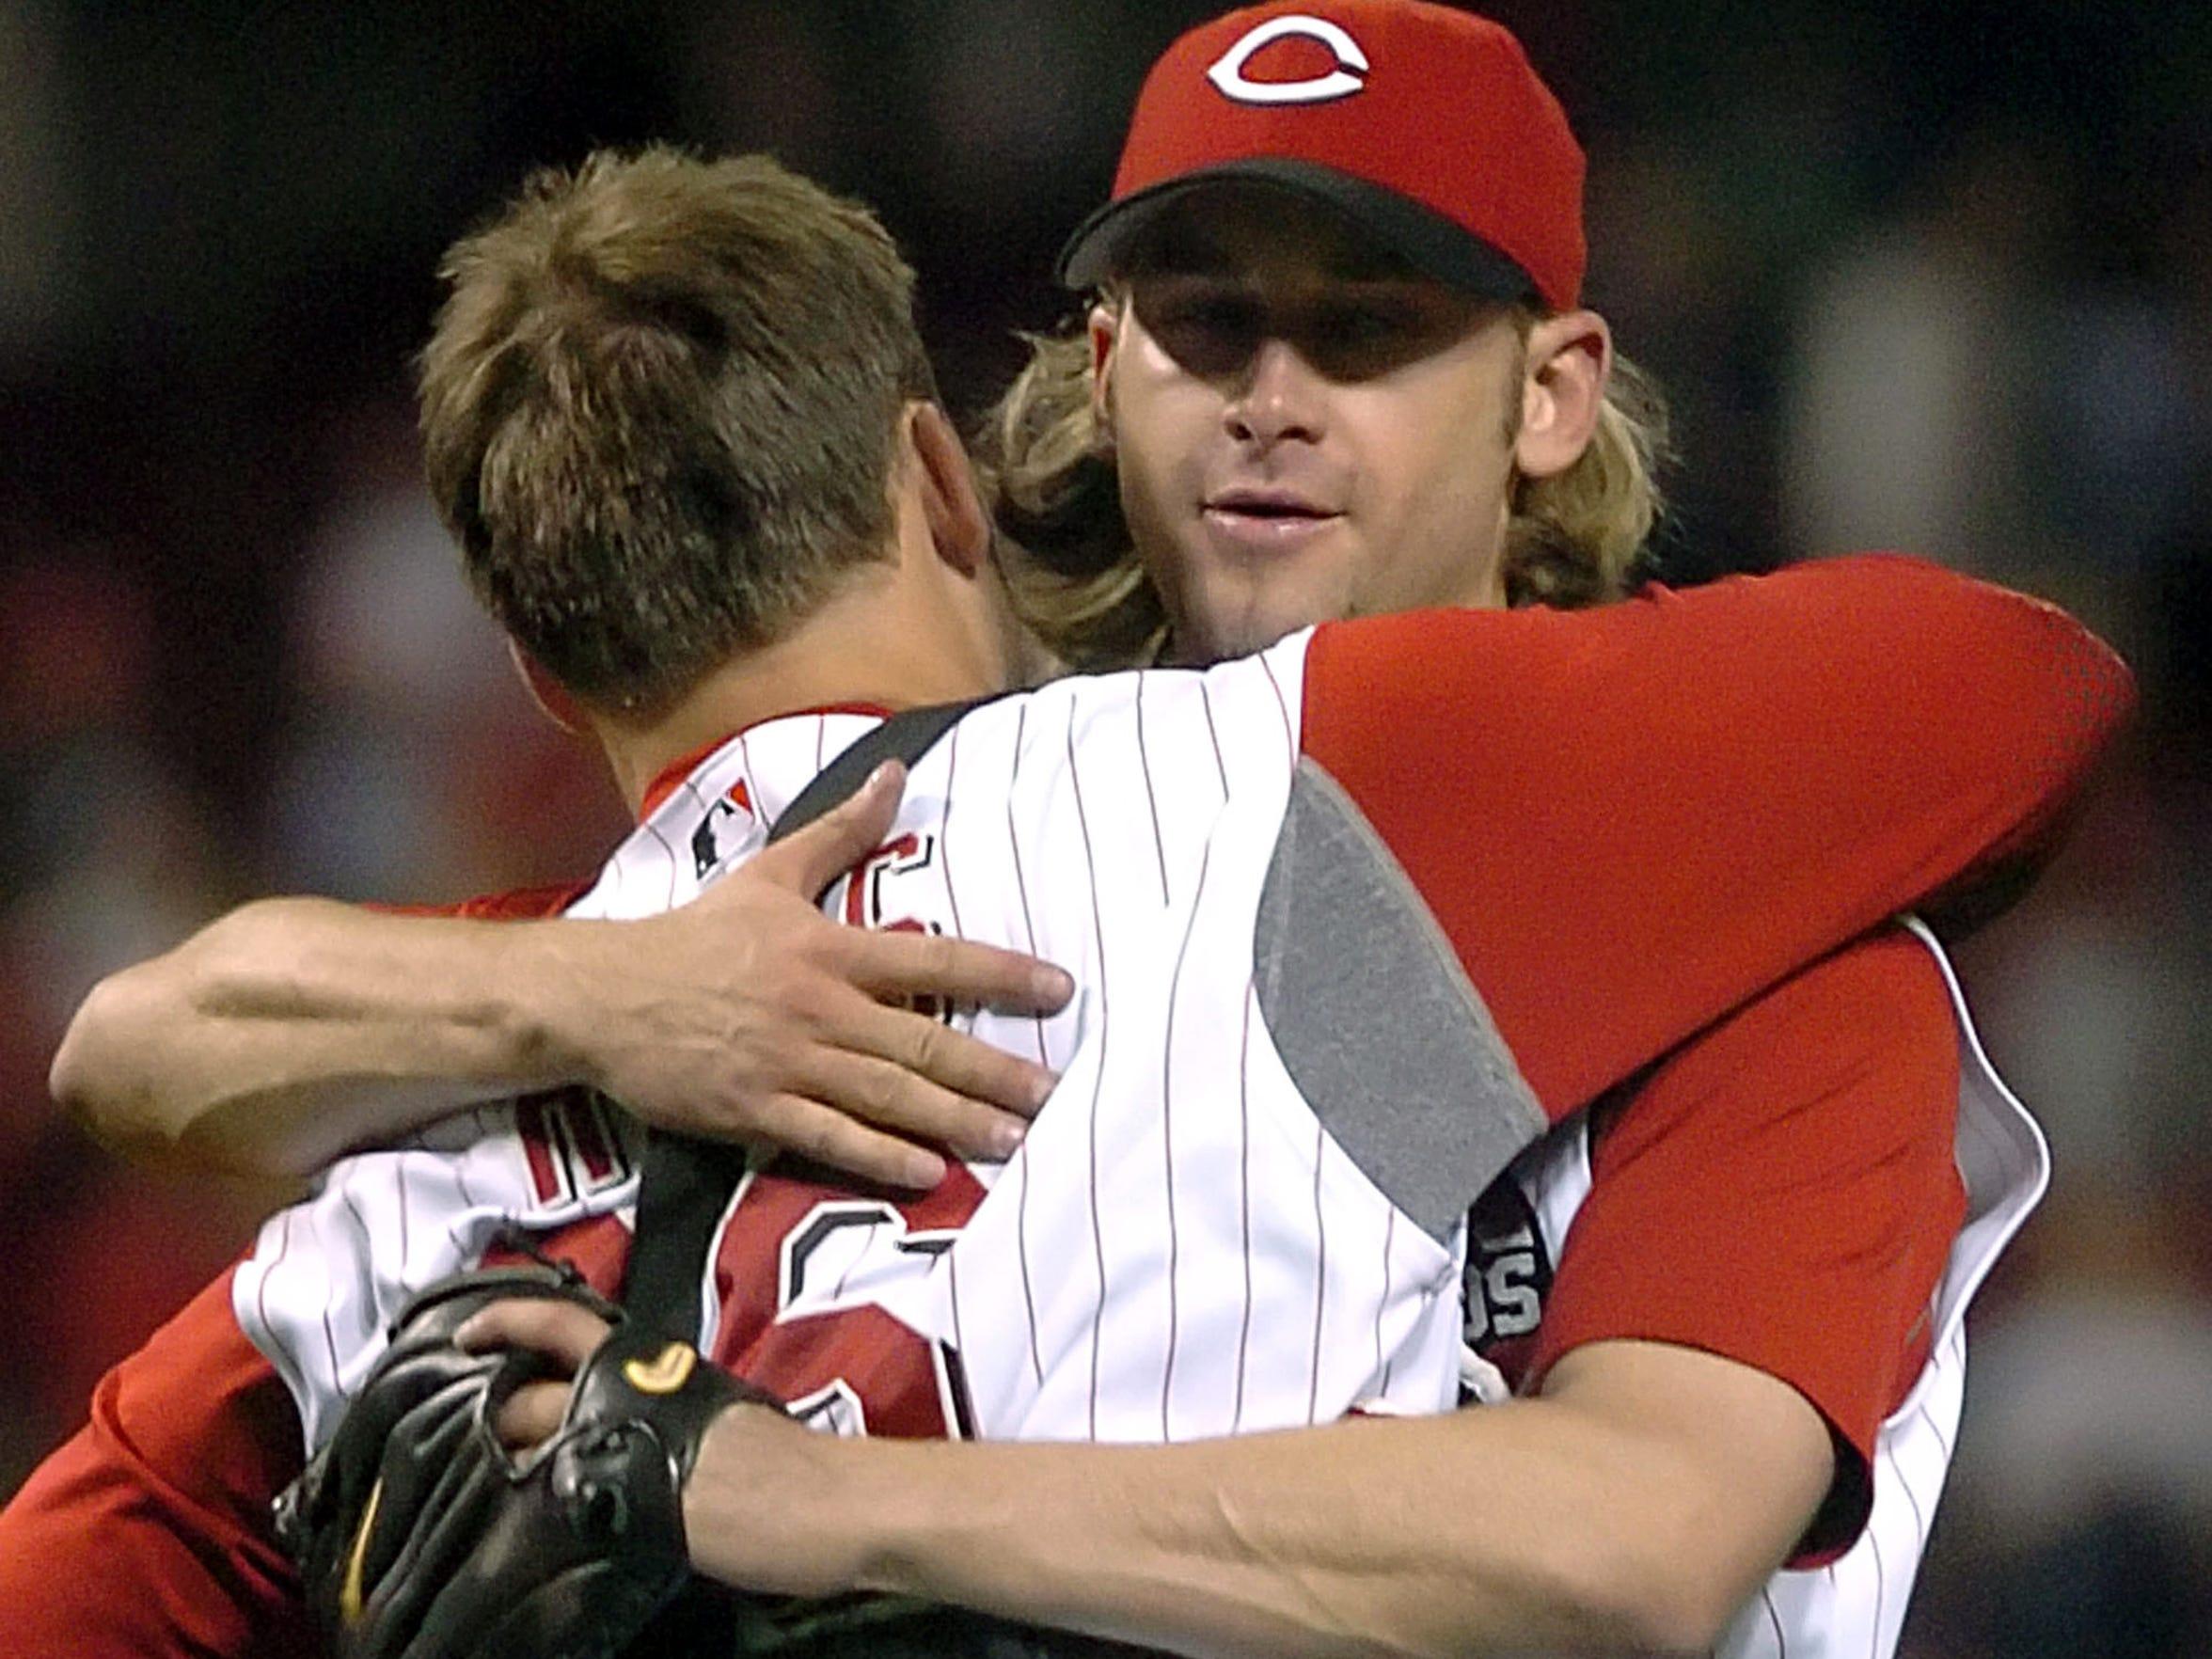 Cincinnati Reds' pitcher Bronson Arroyo, right, hugs